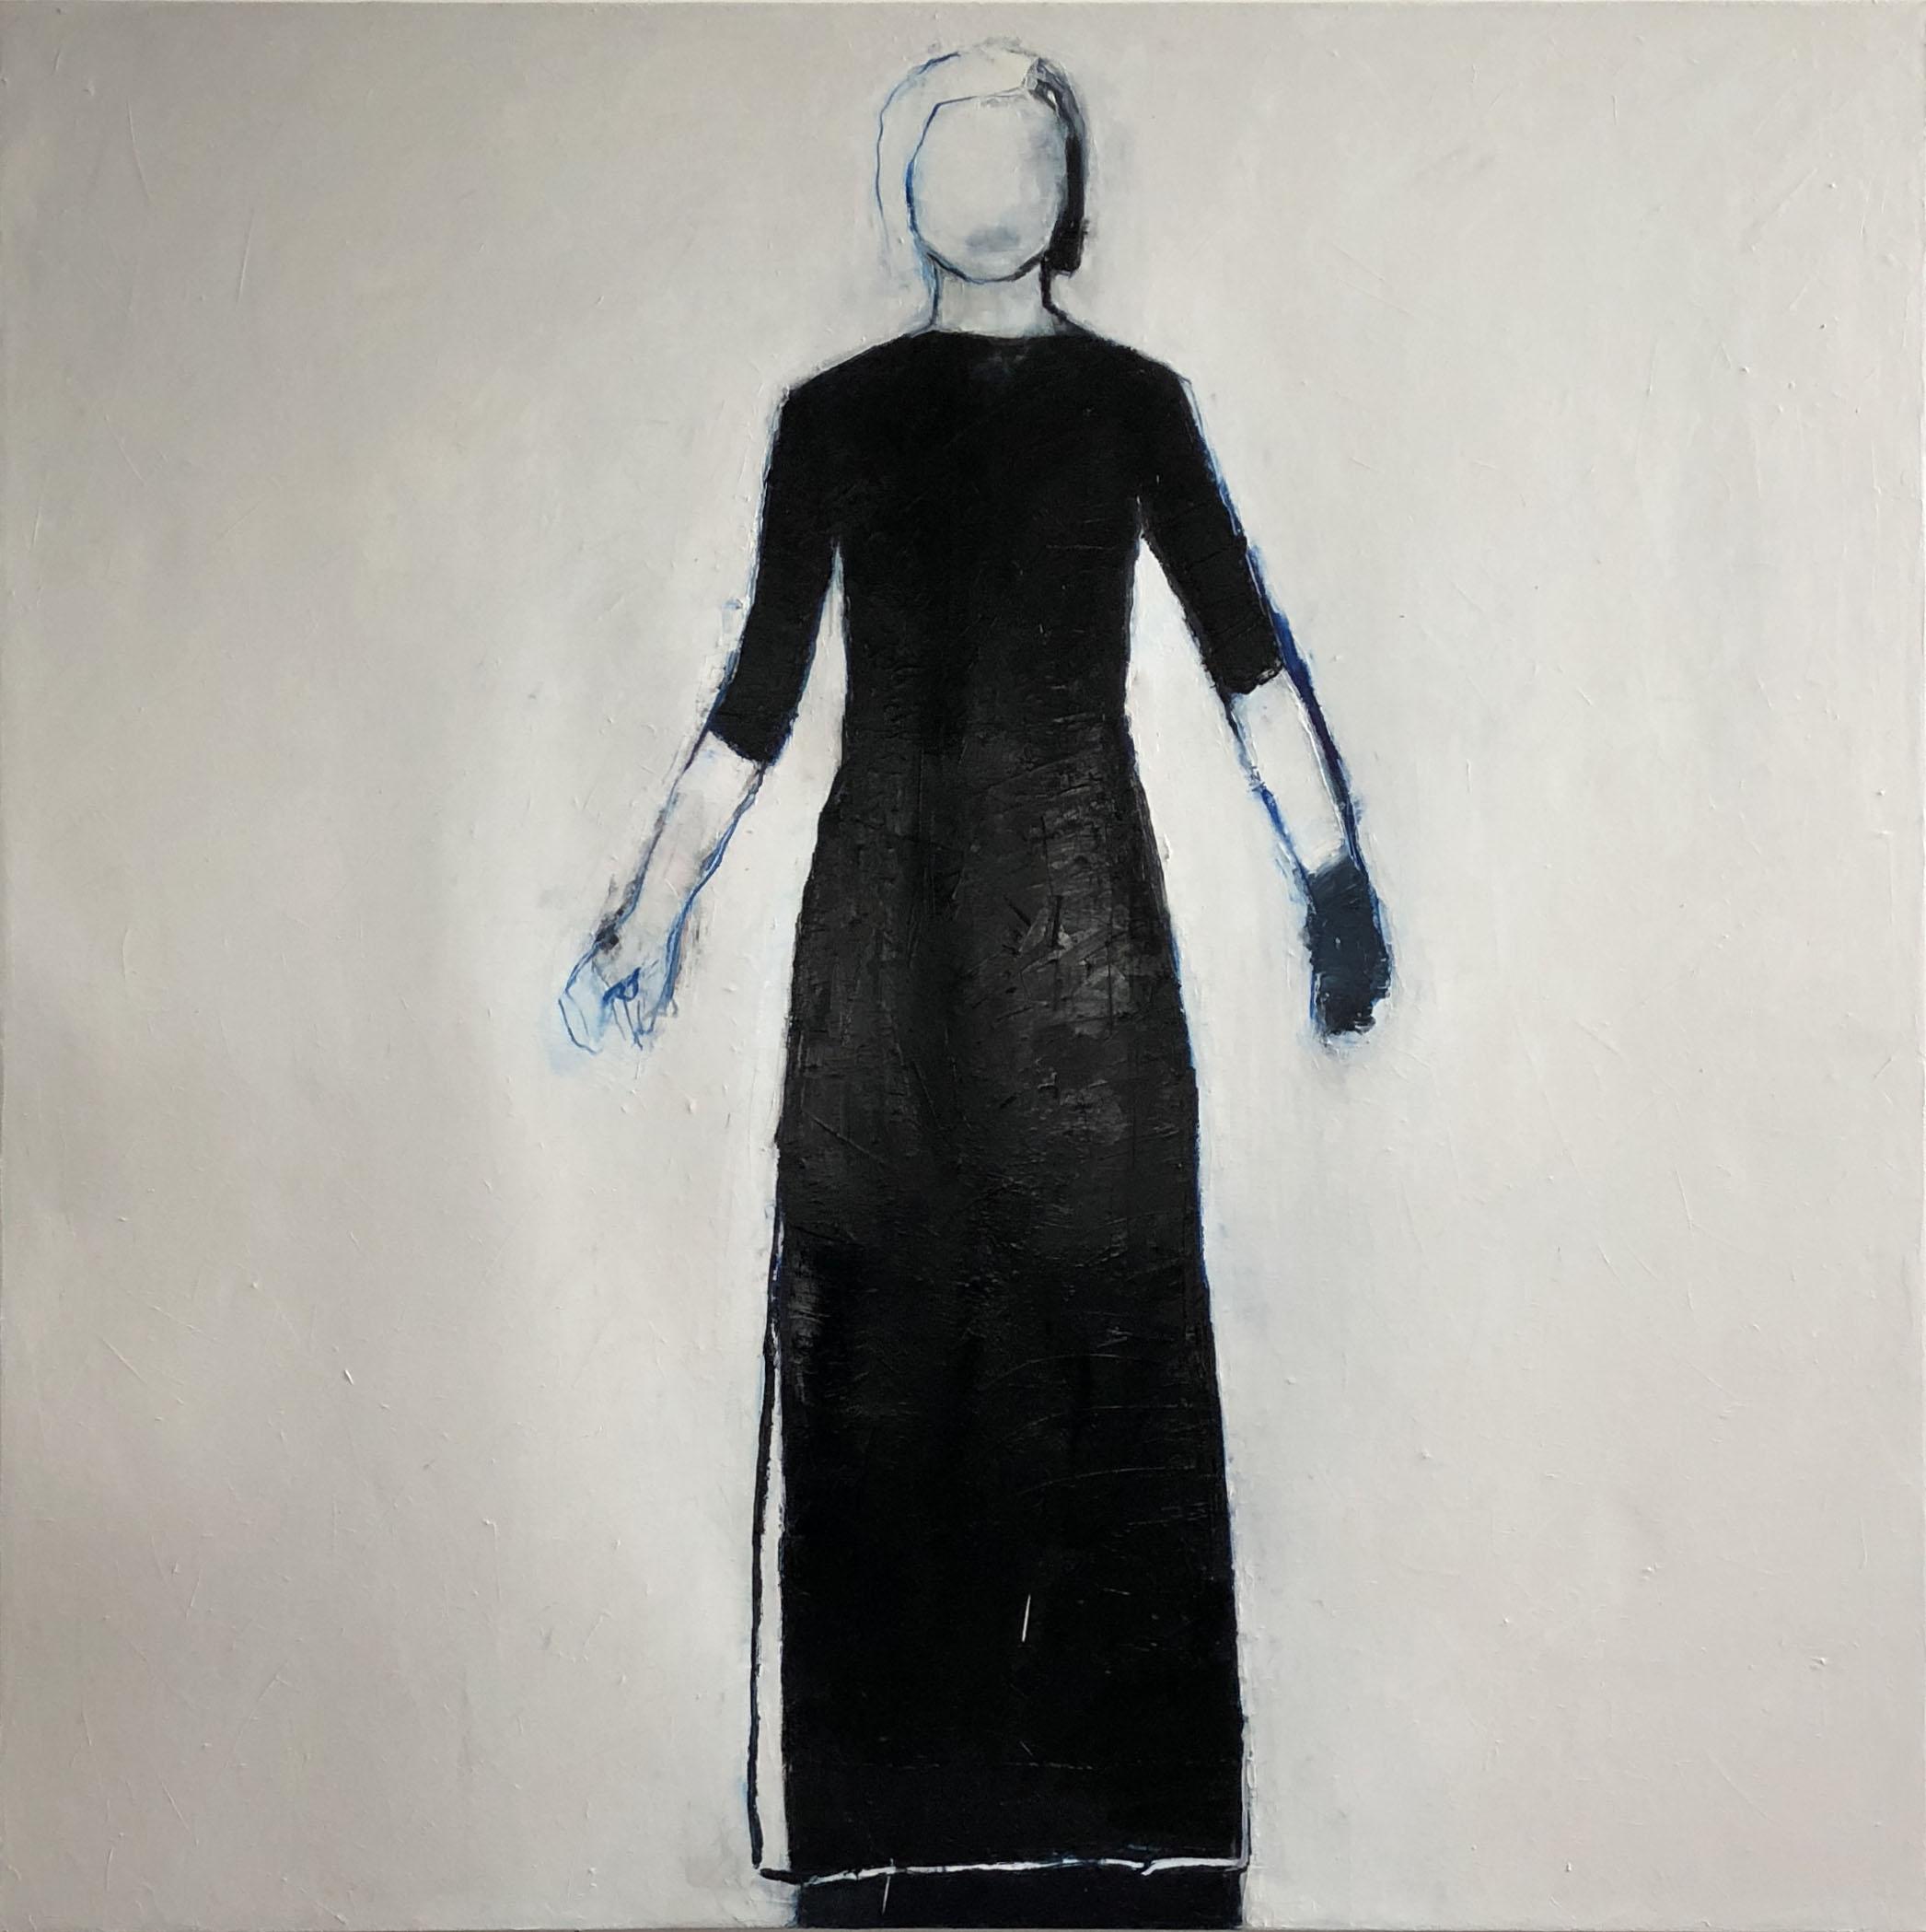 Linda Stojak Painting 2018 - 2020 Figure in dress